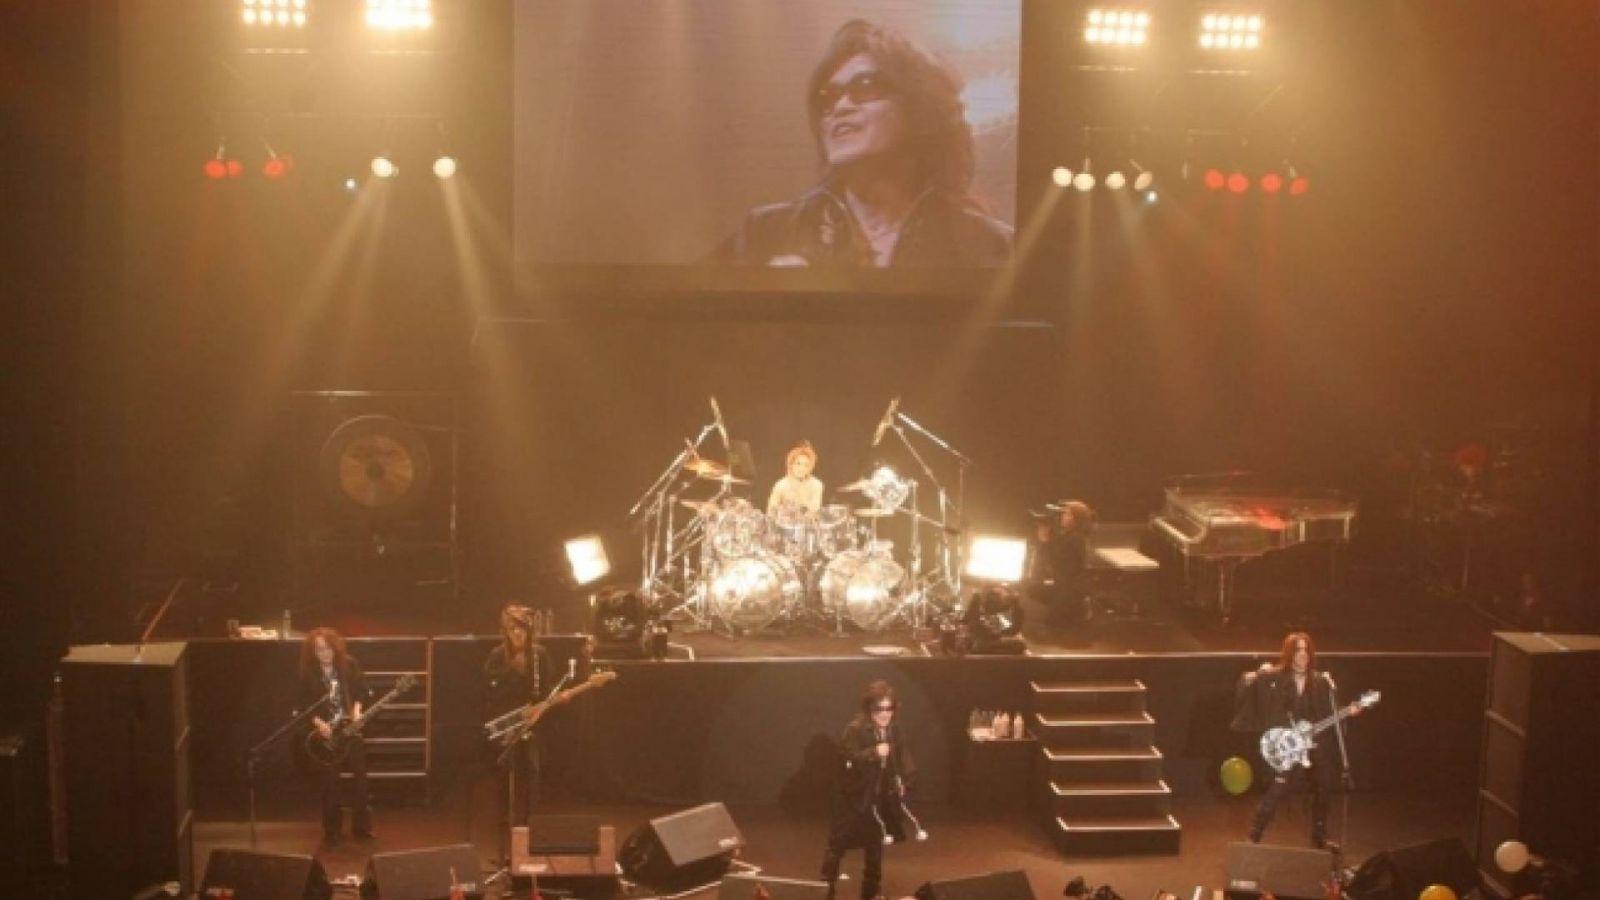 X JAPAN - Countdown-konsertti, Akasaka BLITZ, Tokio, Japani © X JAPAN